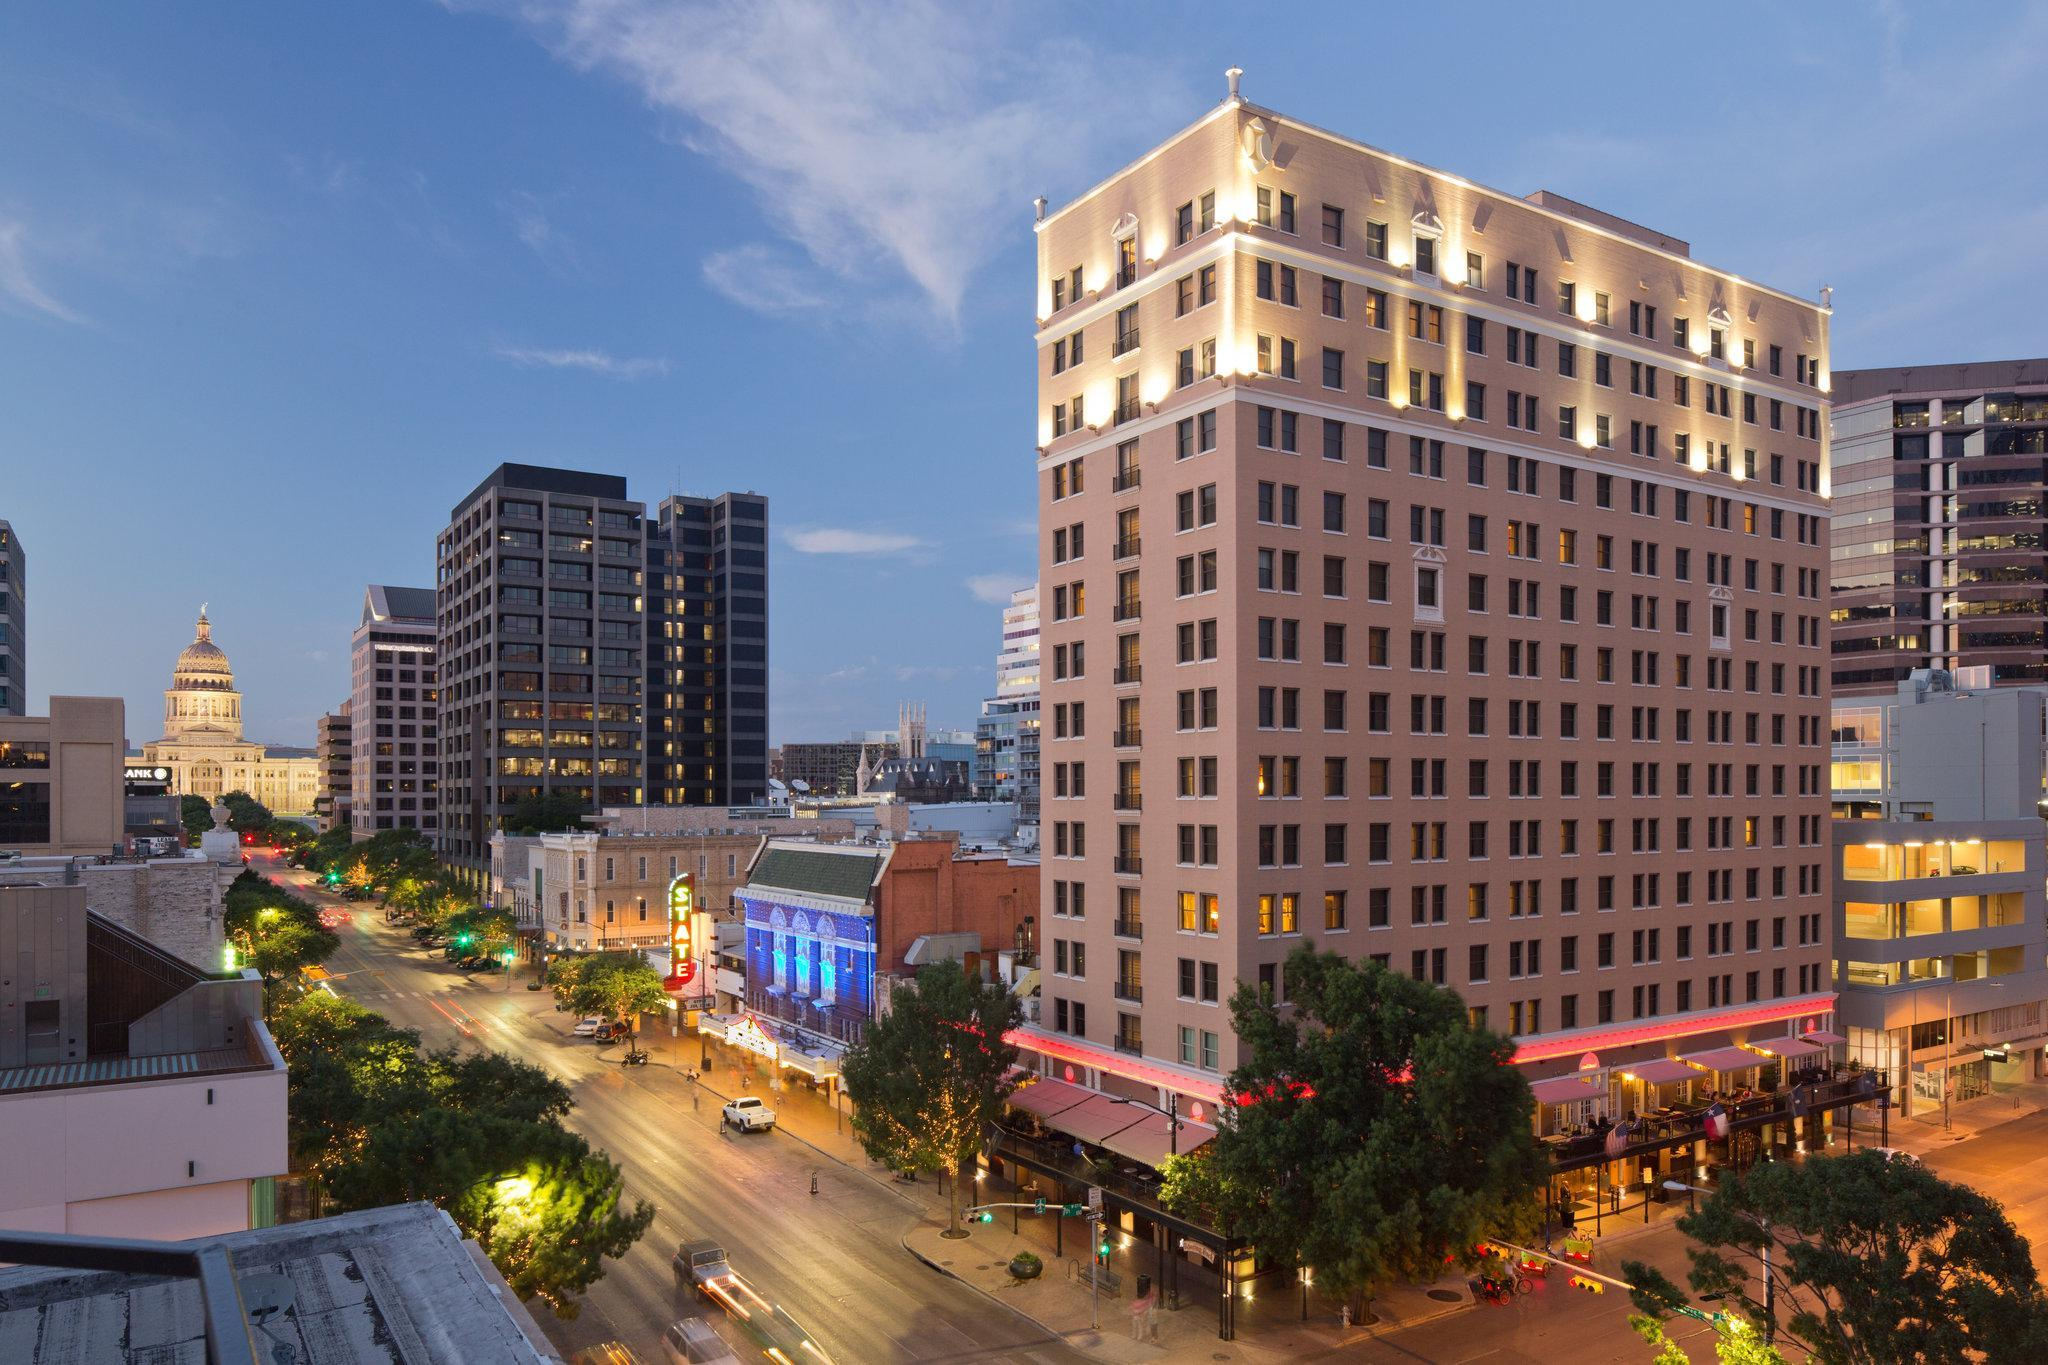 InterContinental Hotel Stephen F. Austin